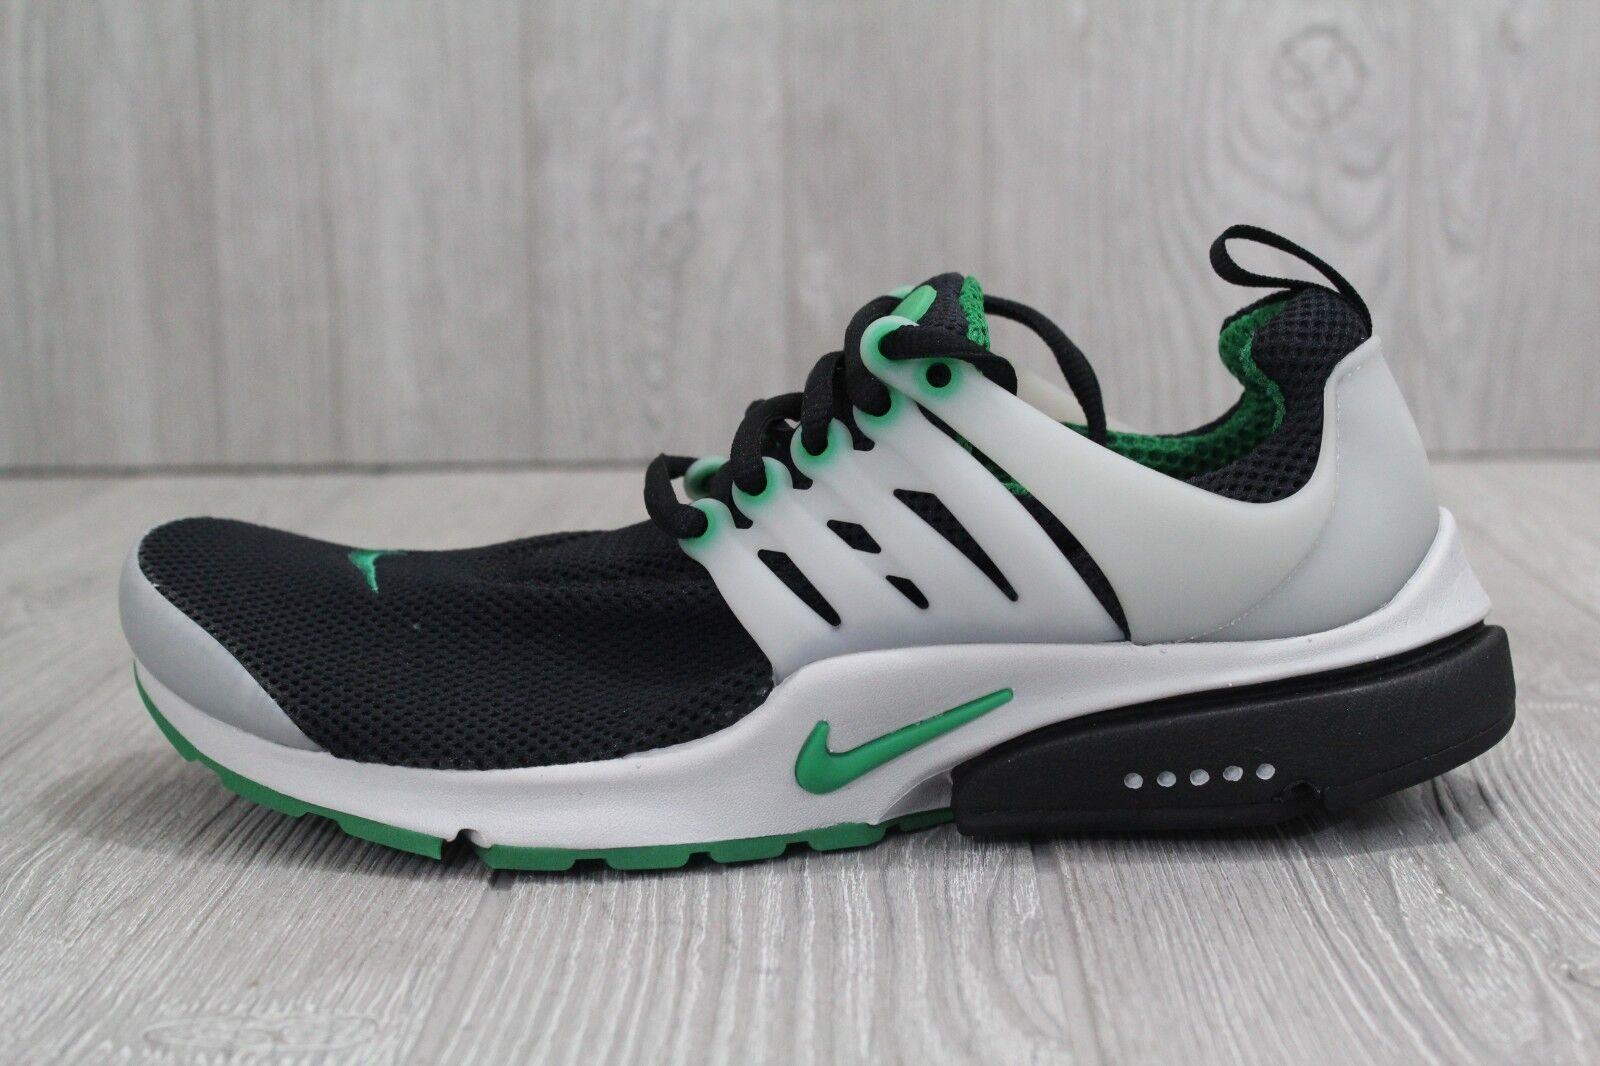 42291514c9 30 New Nike Air Presto Essential Black Green Running shoes 848187 003 Men's  8-11